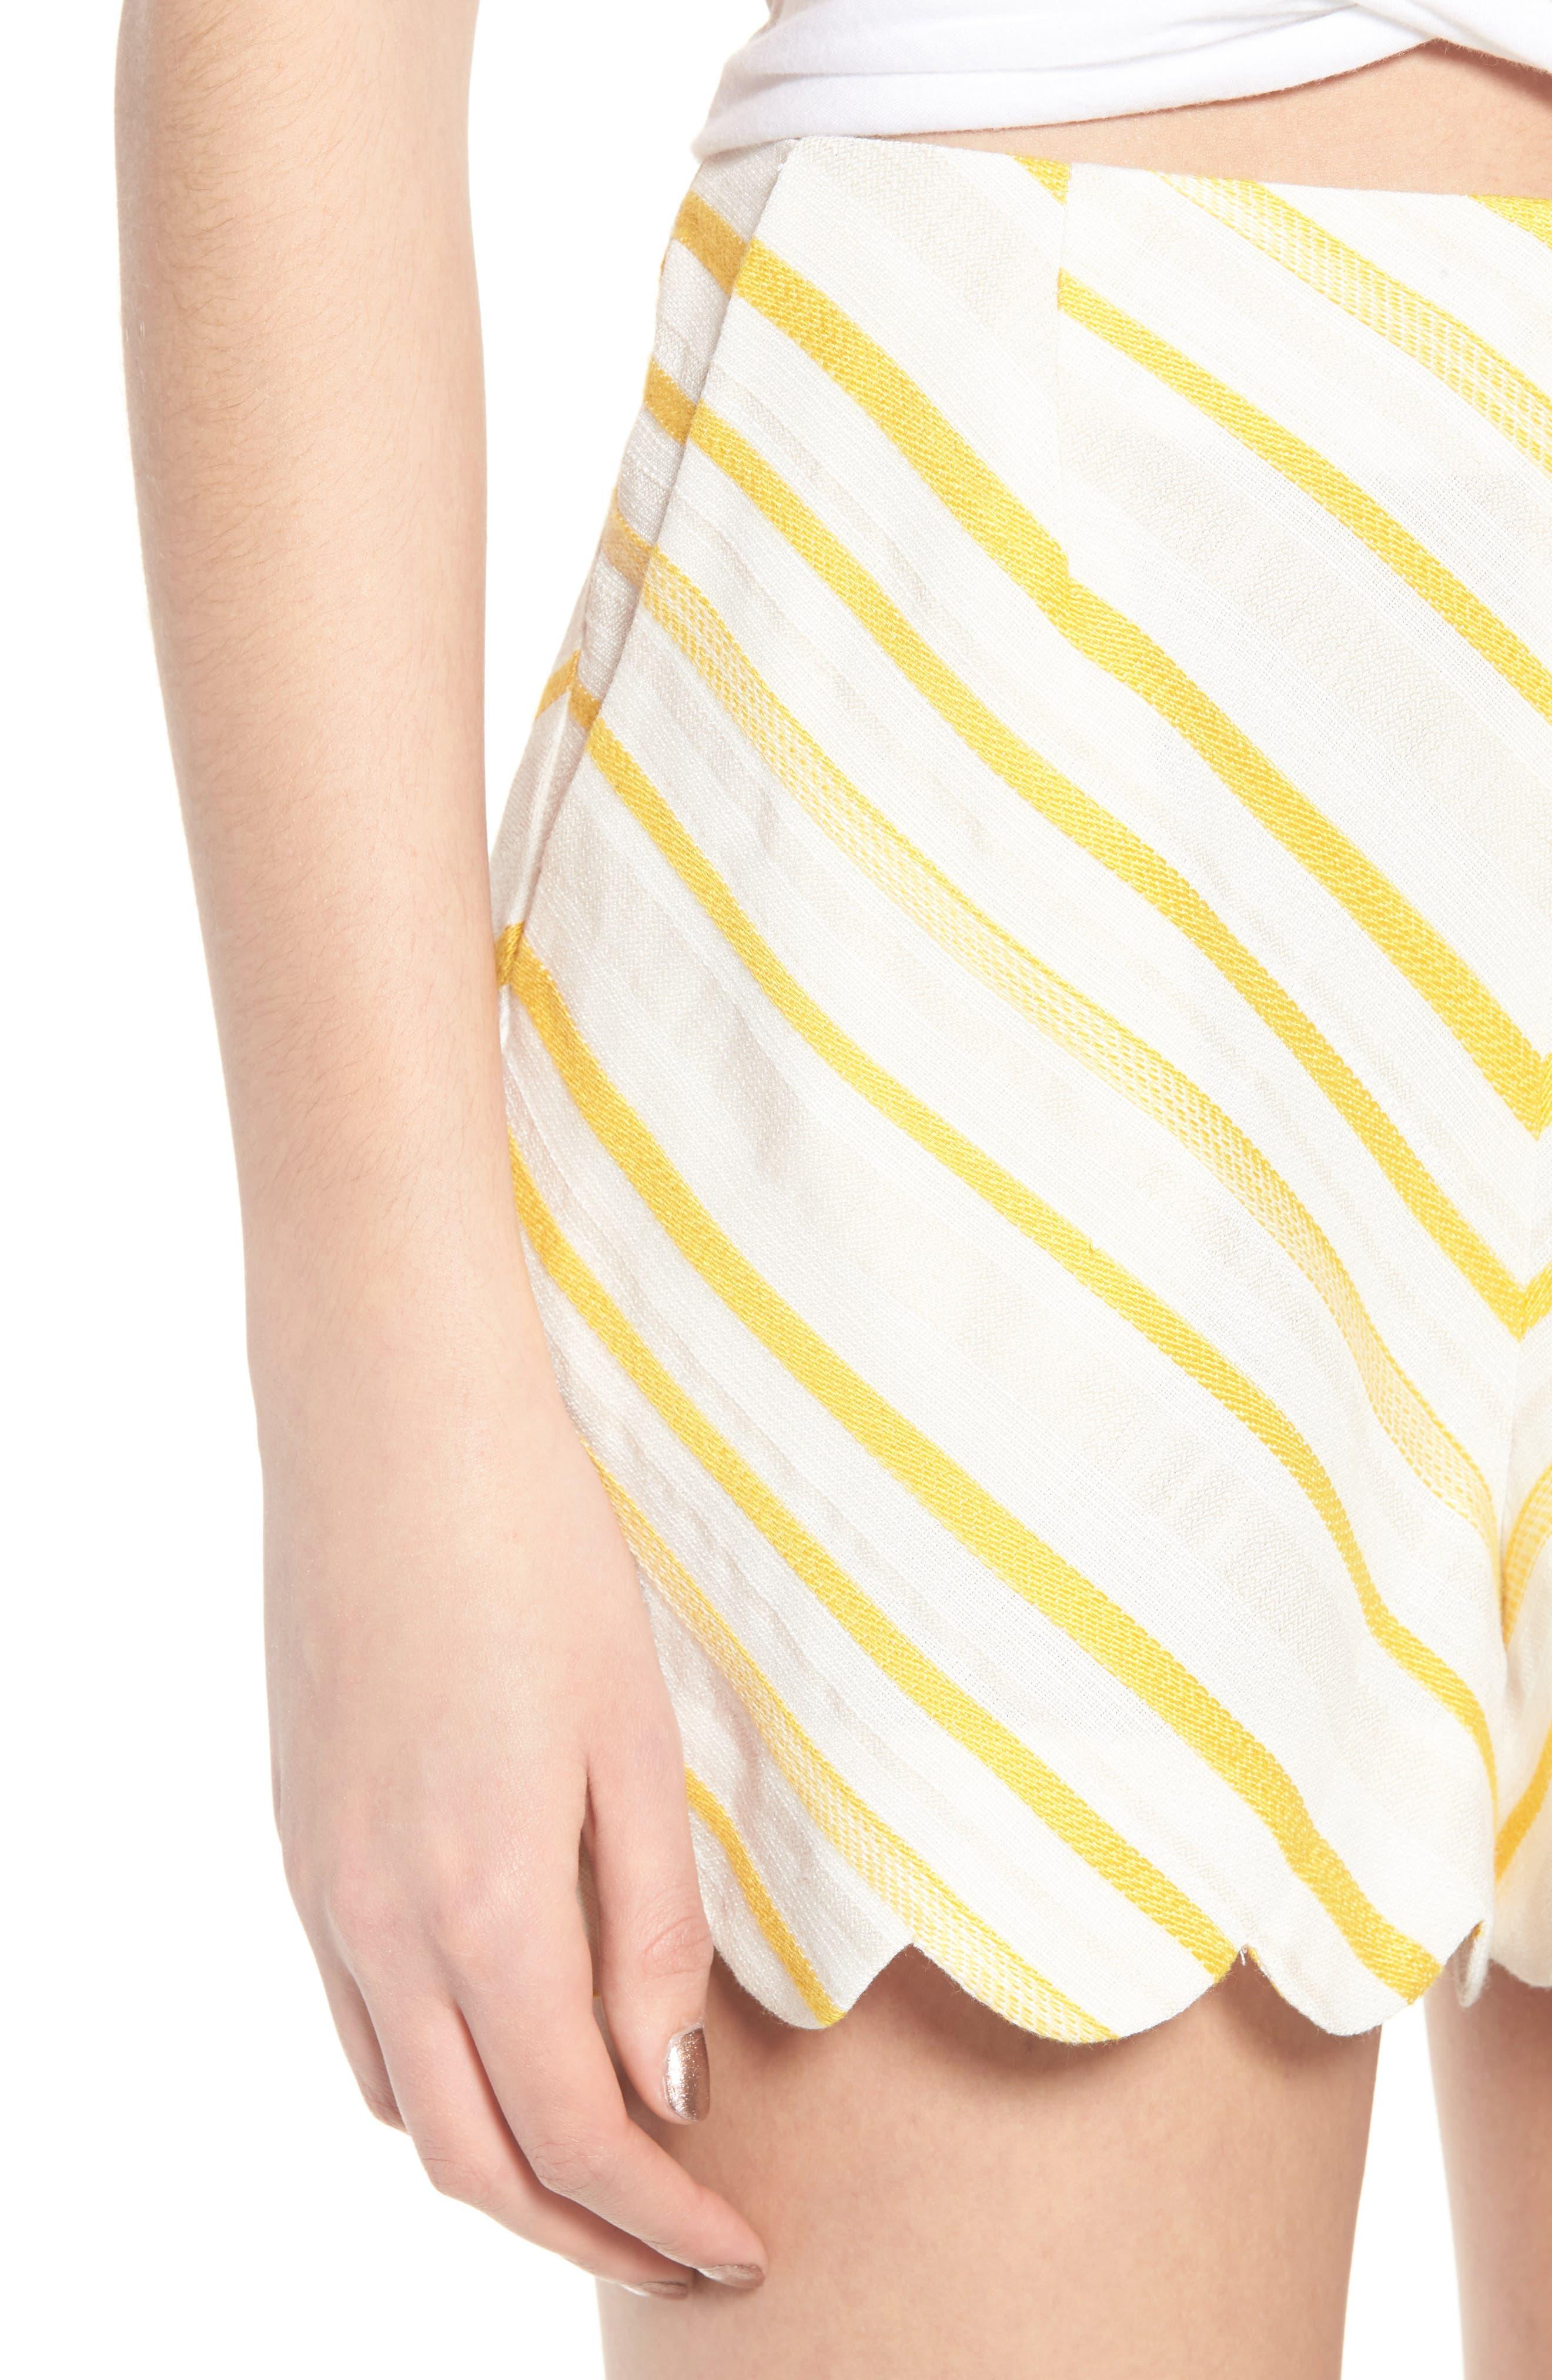 Scallop Shorts,                             Alternate thumbnail 4, color,                             Cream Yellow